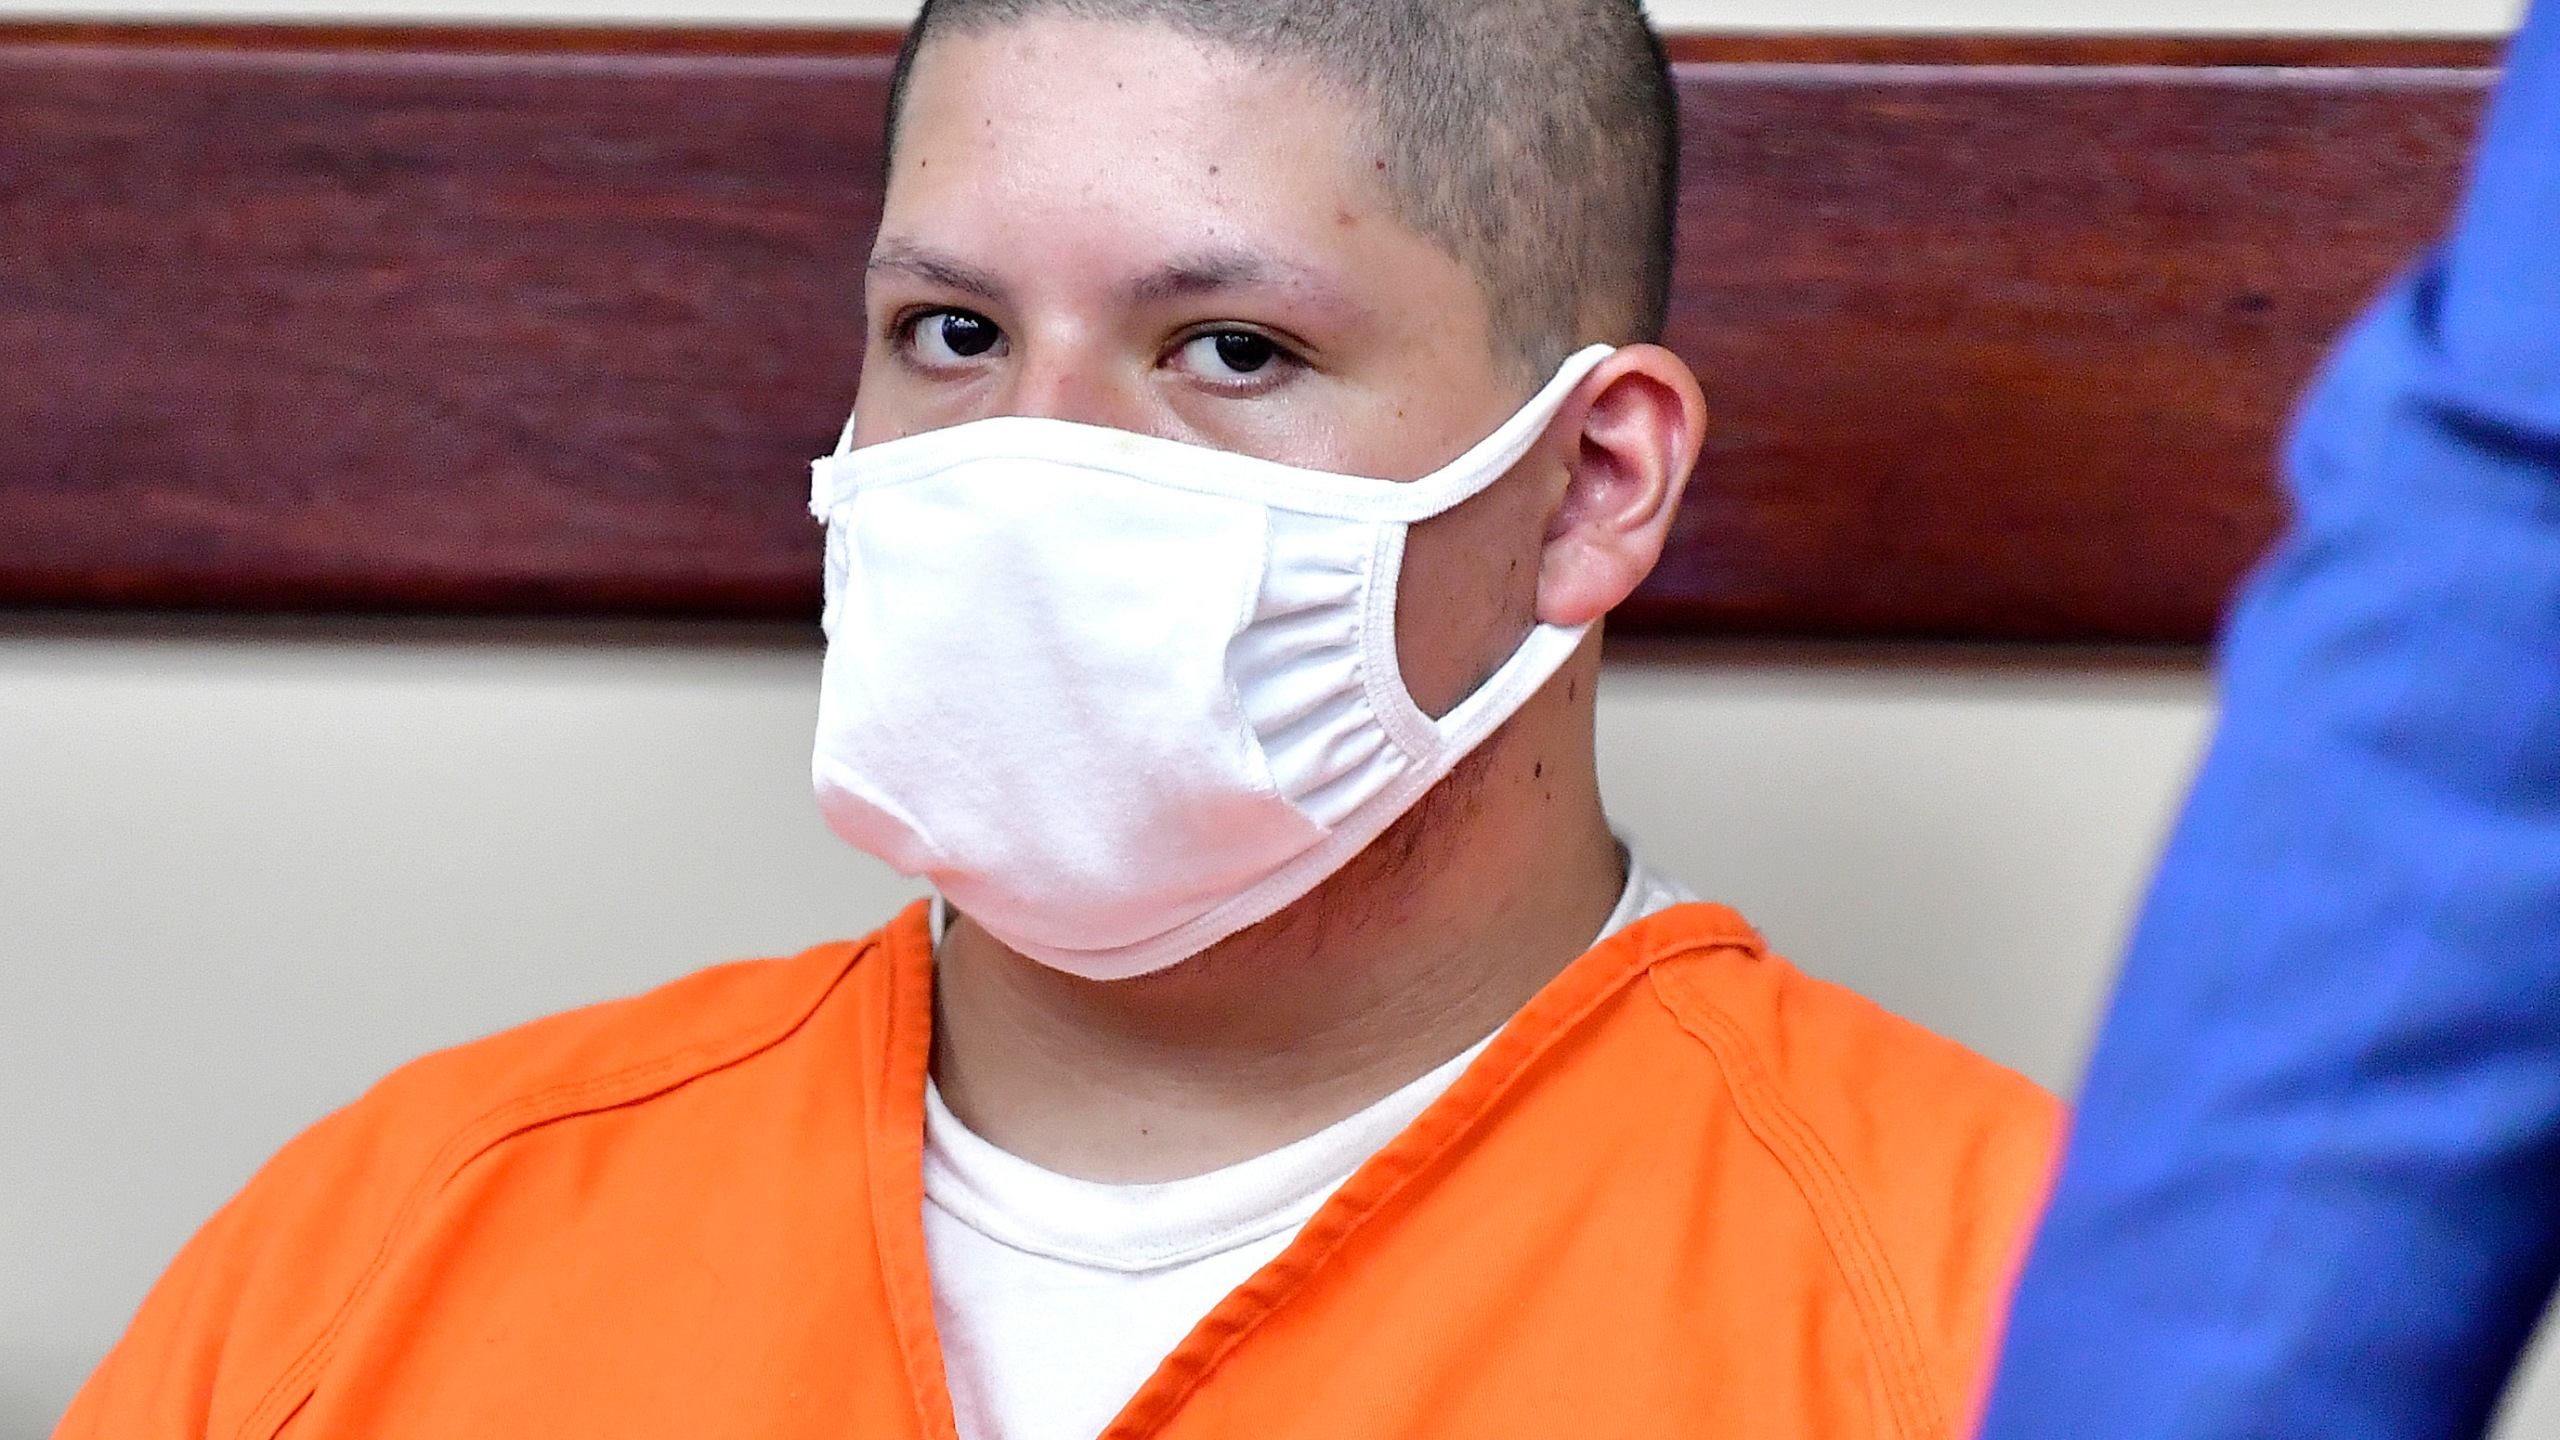 Joseph Jimenez, 20, left, appears in the Riverside Hall of Justice on July 30, 2021, in Riverside, Calif. (Will Lester/The Orange County Register via AP, File)